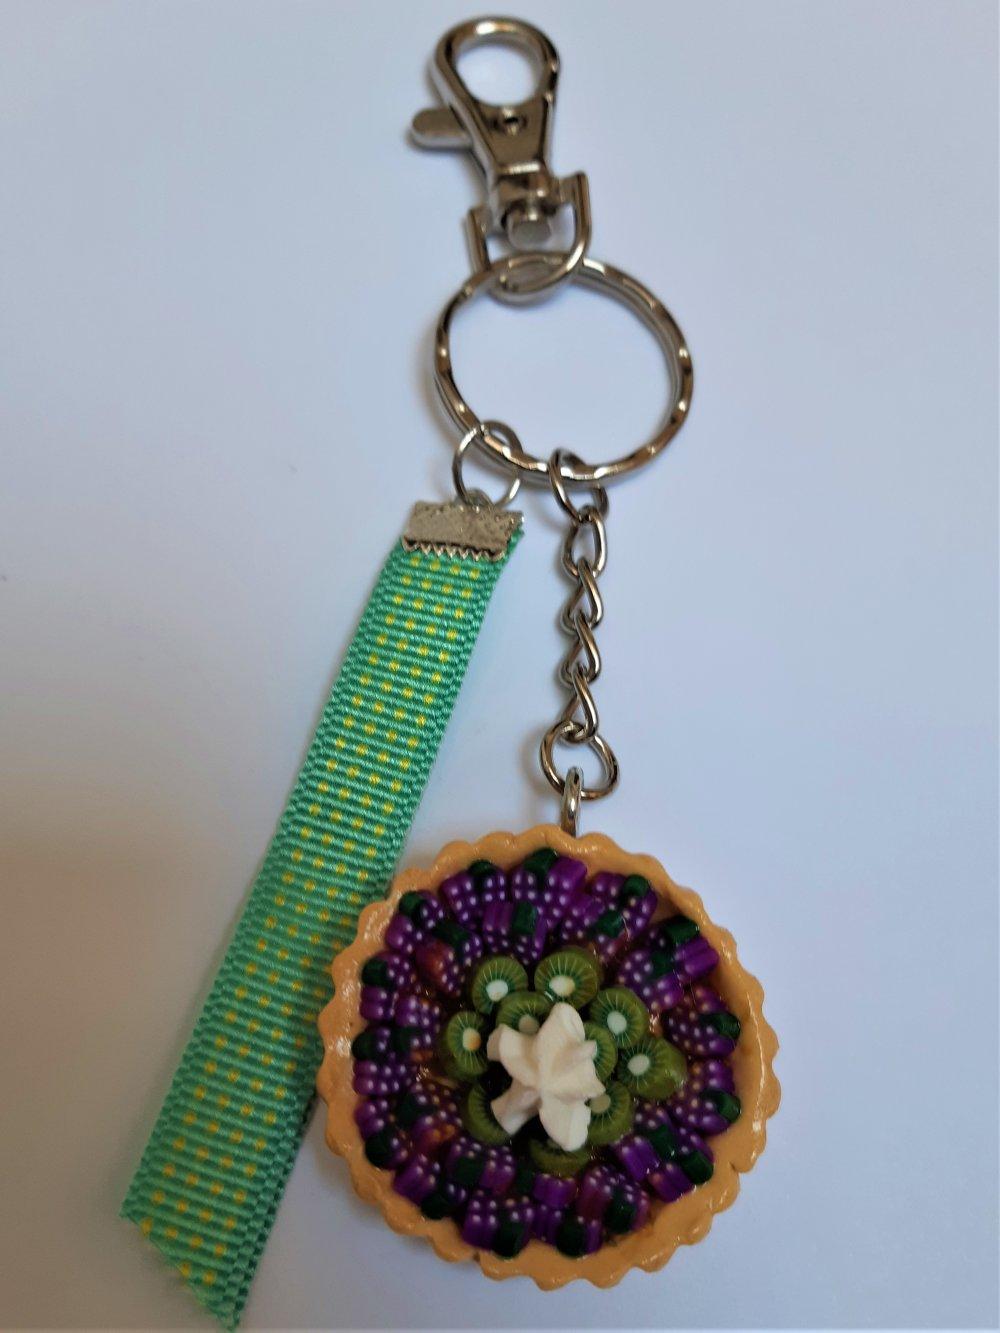 Bijou de sac / Porte-clés Tarte aux raisins et Kiwi